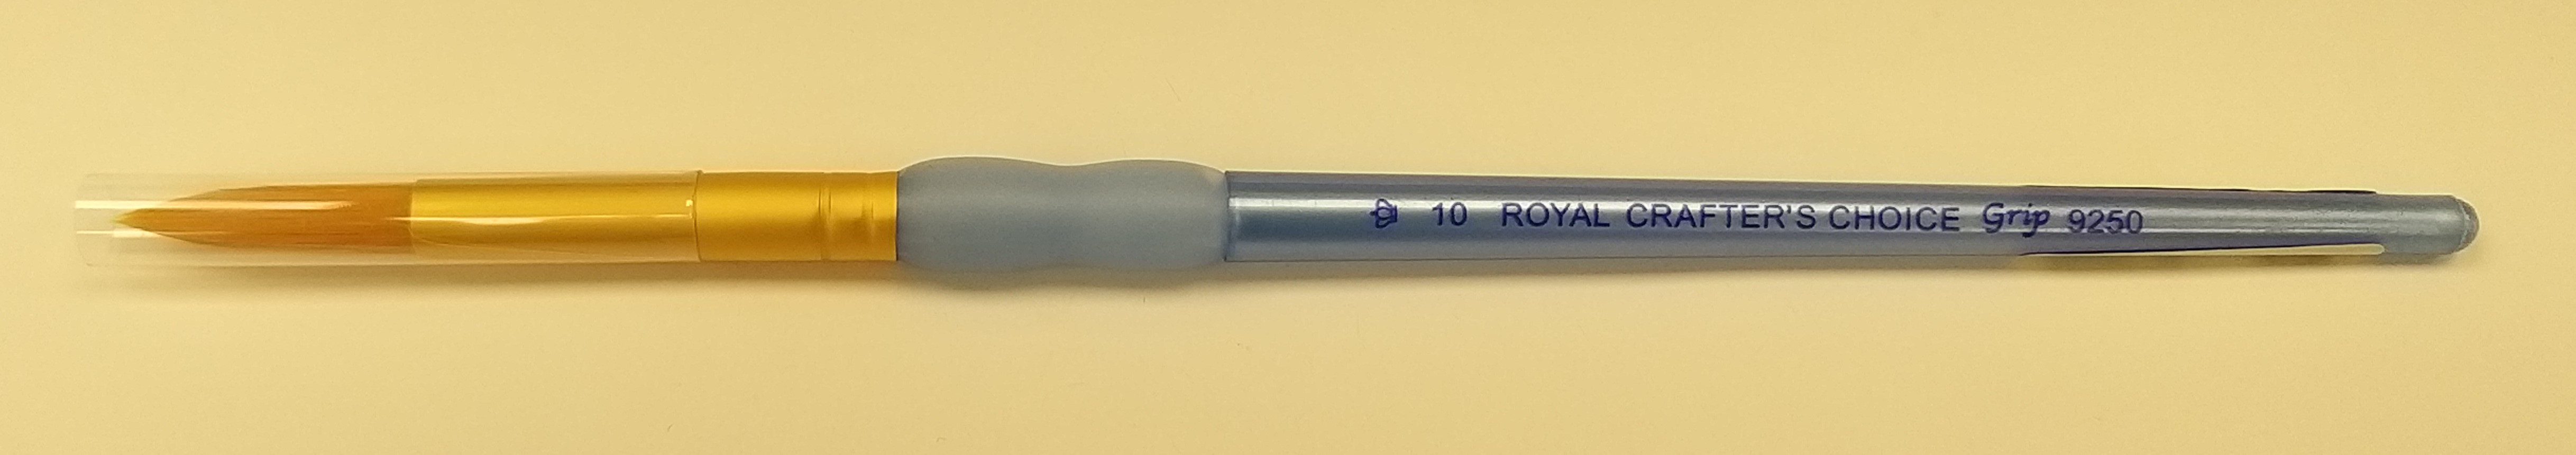 Large Round Brush (Soft-grip)